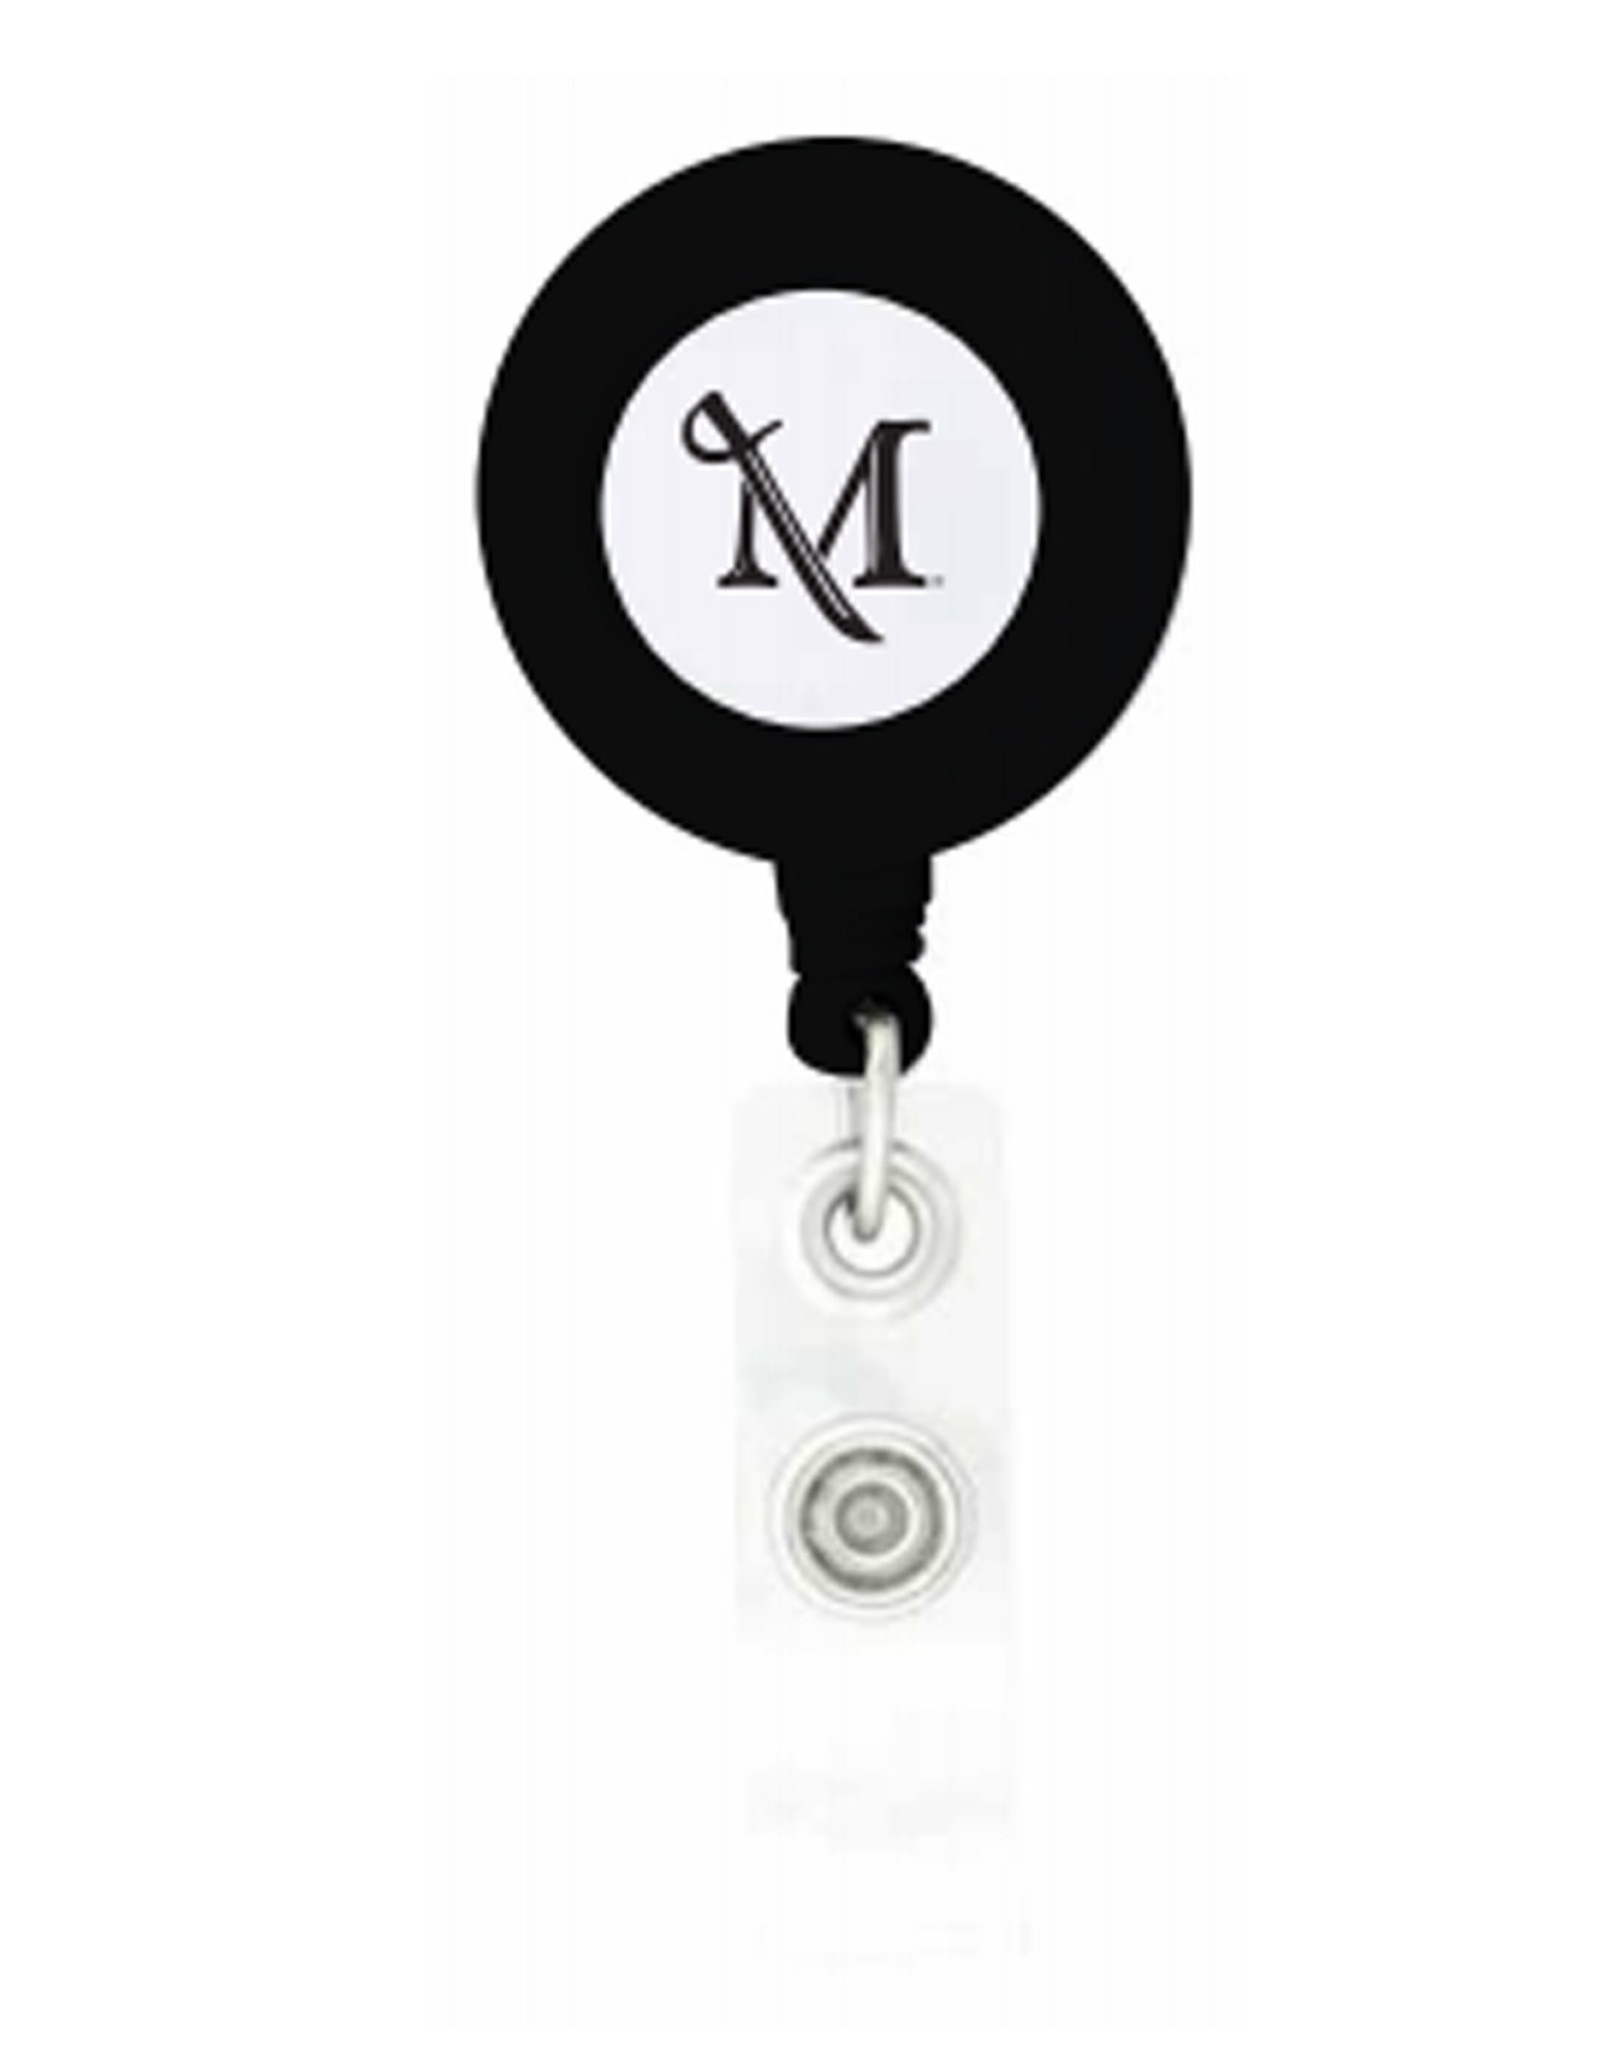 M Sword Badge Holder - Black